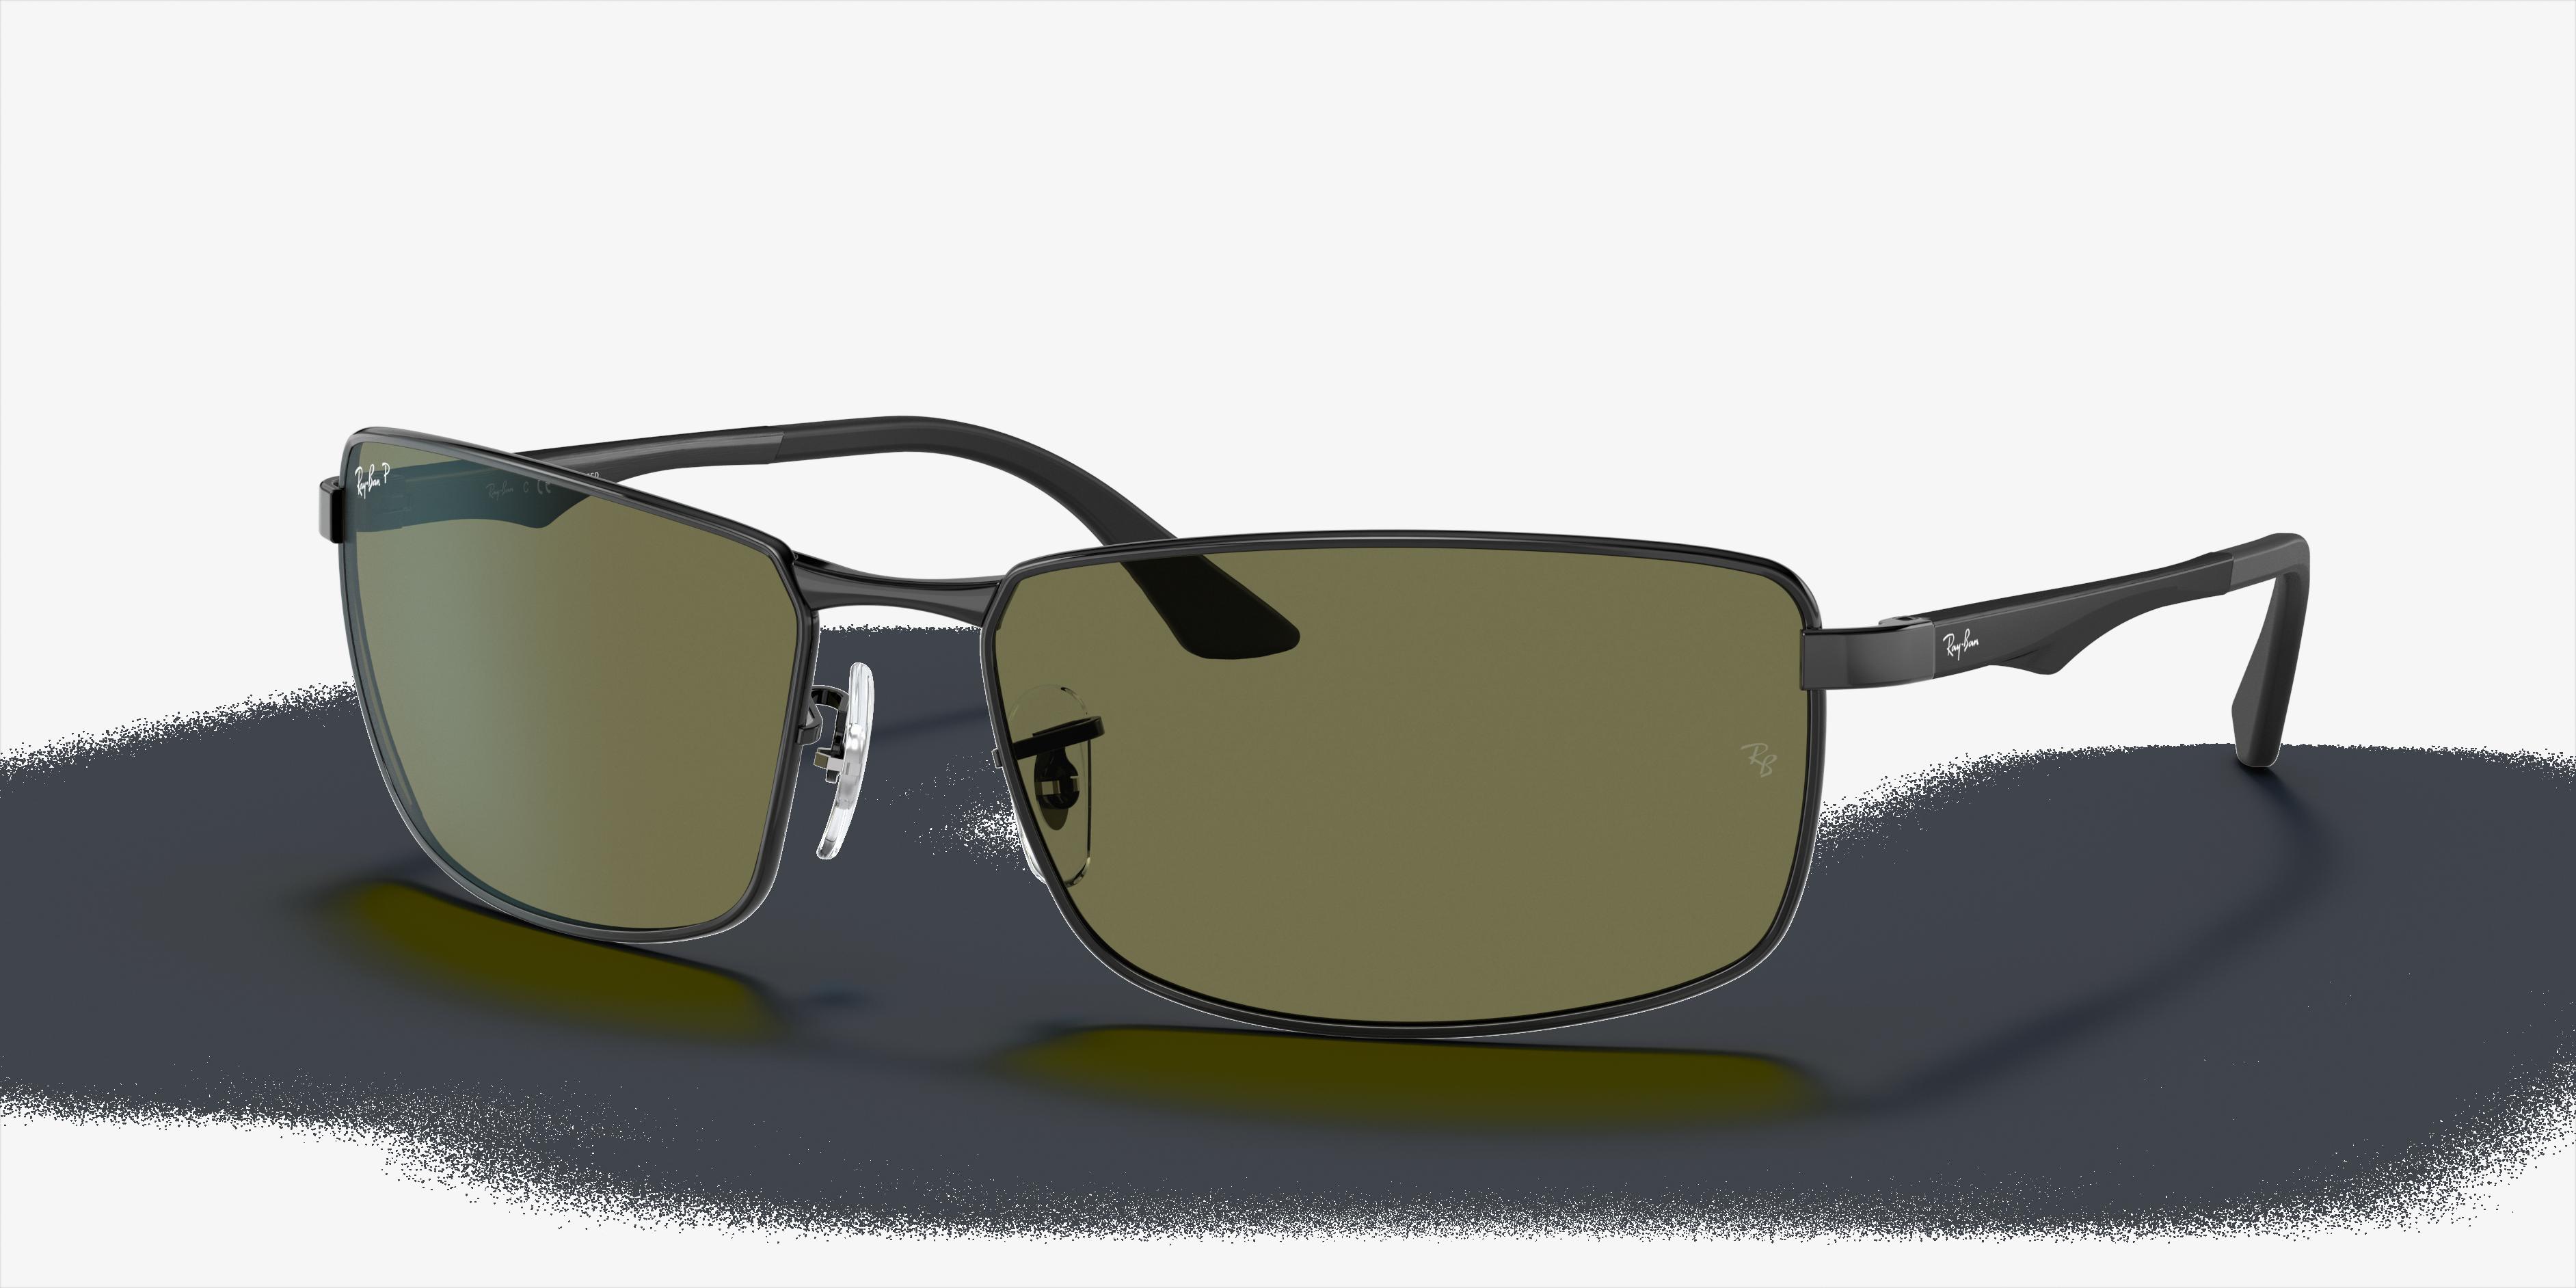 Ray-Ban Rb3498 Black, Polarized Green Lenses - RB3498